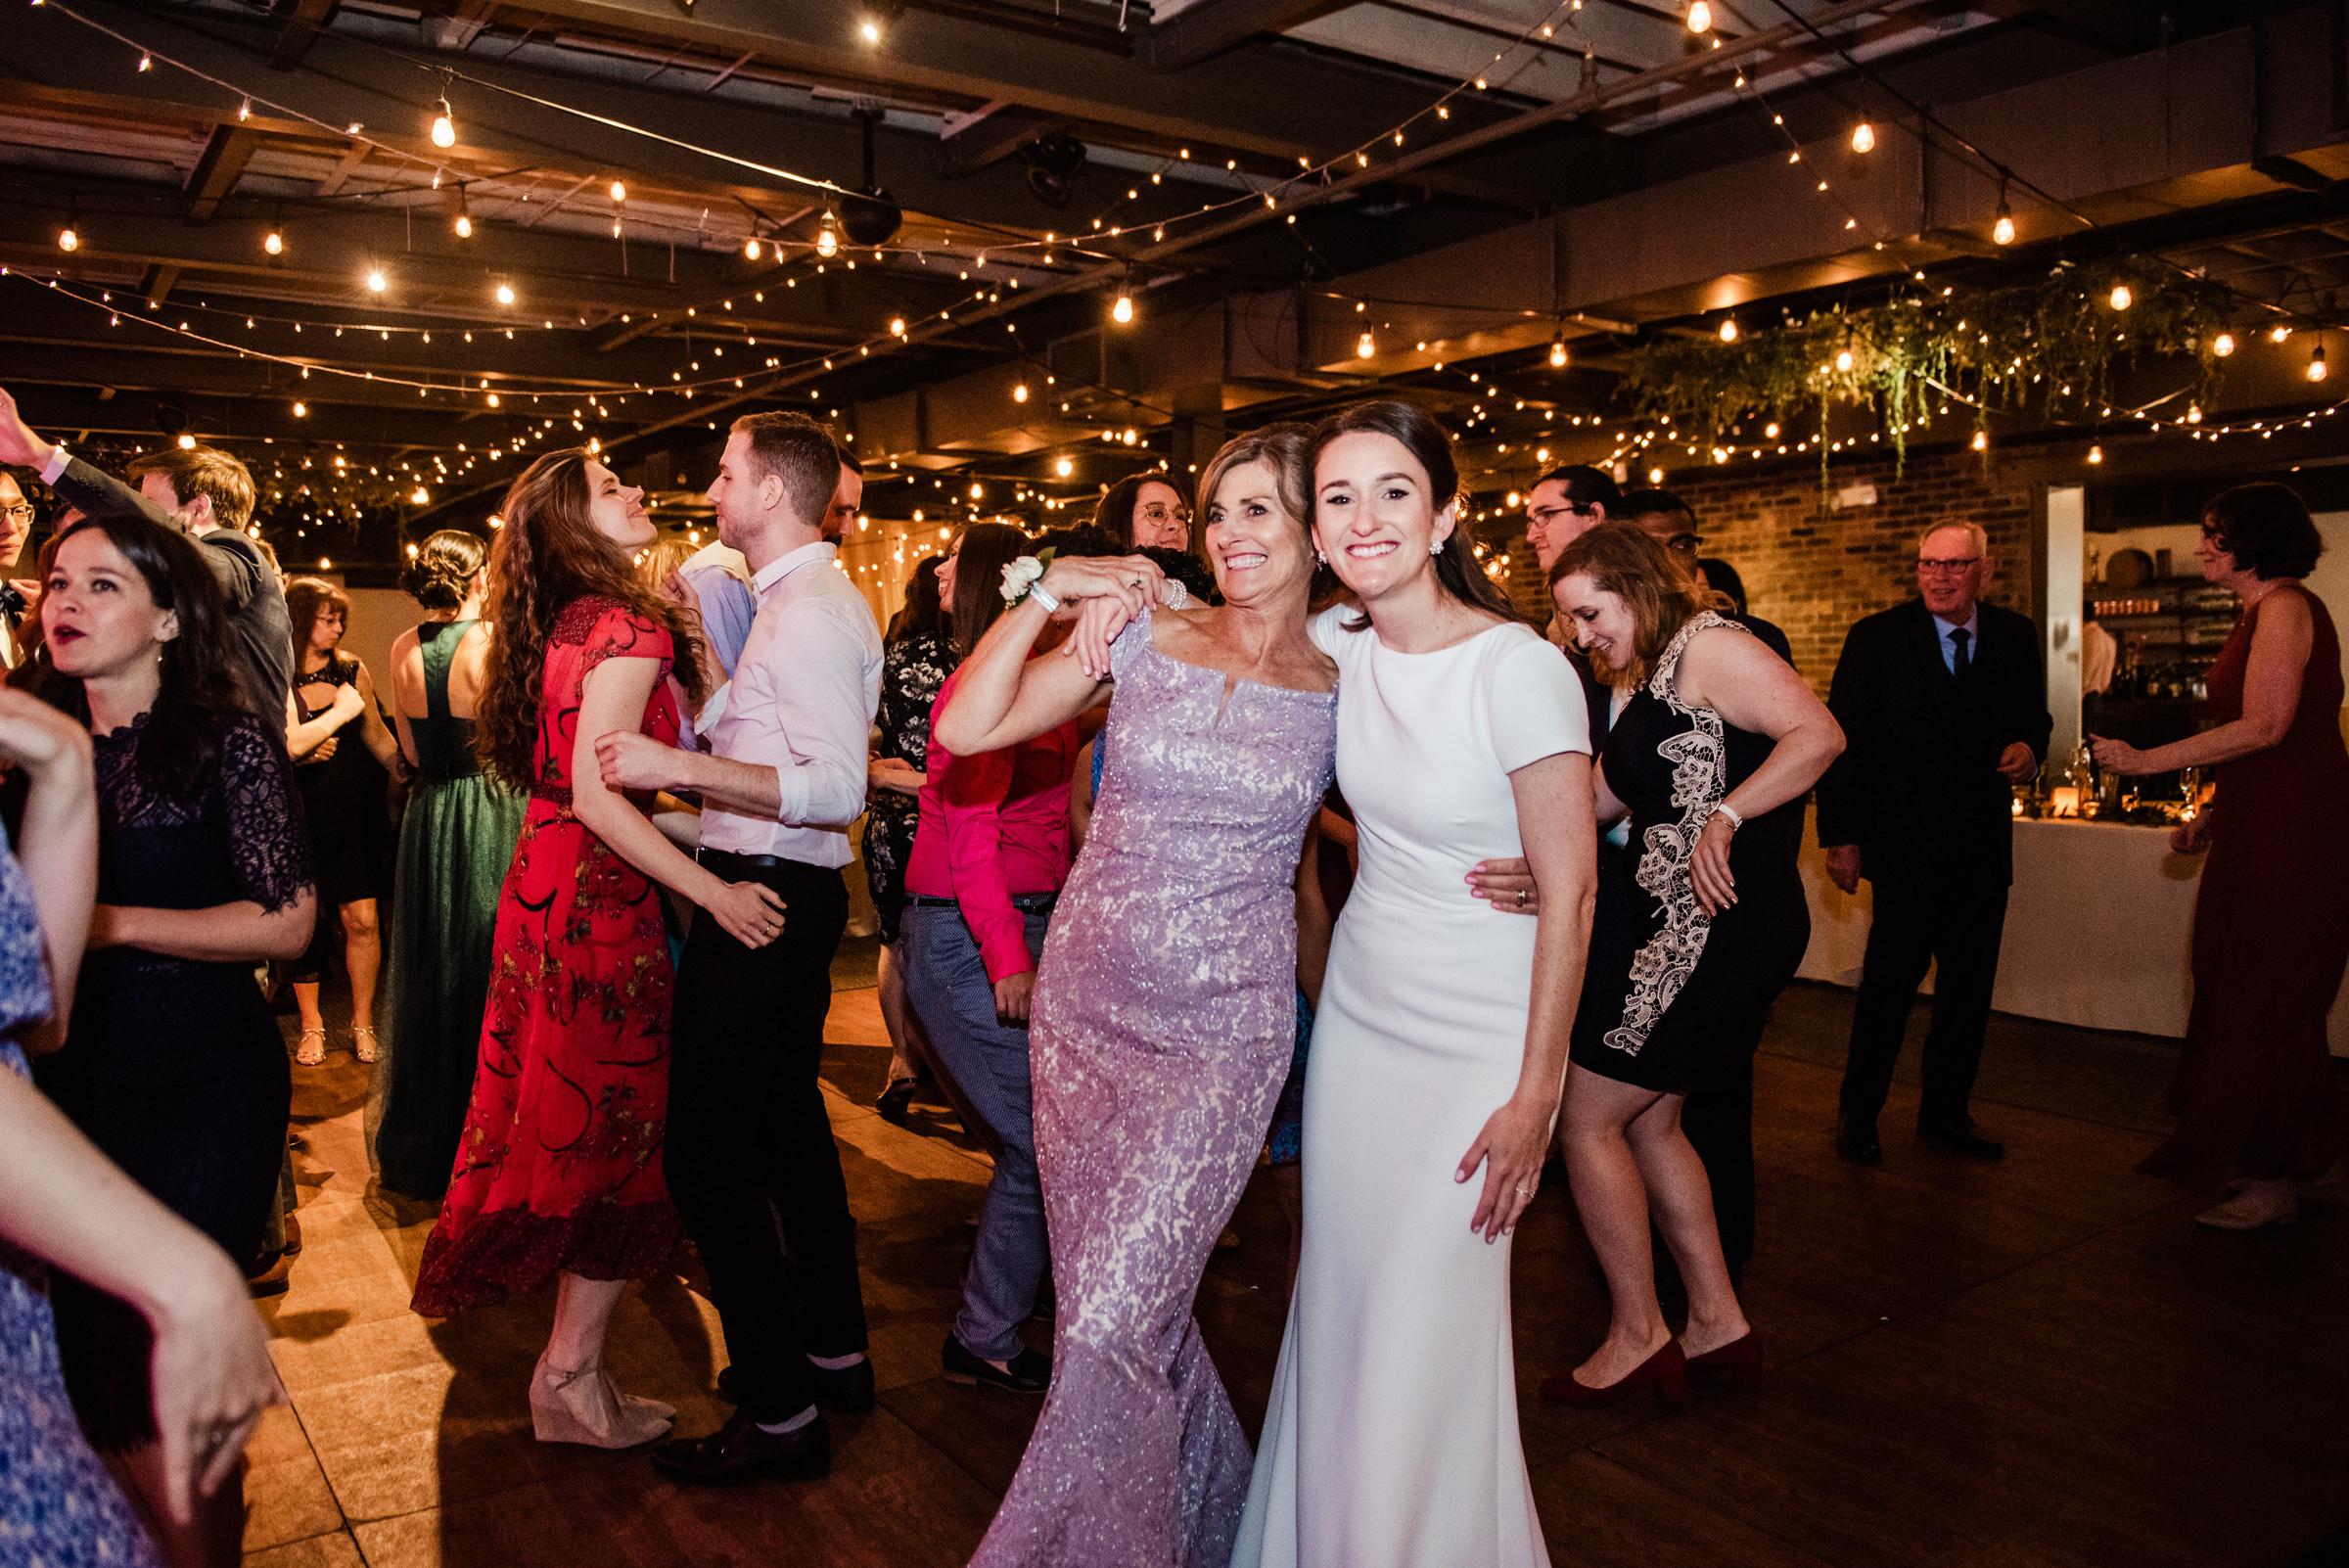 SKY_Armory_Syracuse_Wedding_JILL_STUDIO_Rochester_NY_Photographer_DSC_6366.jpg